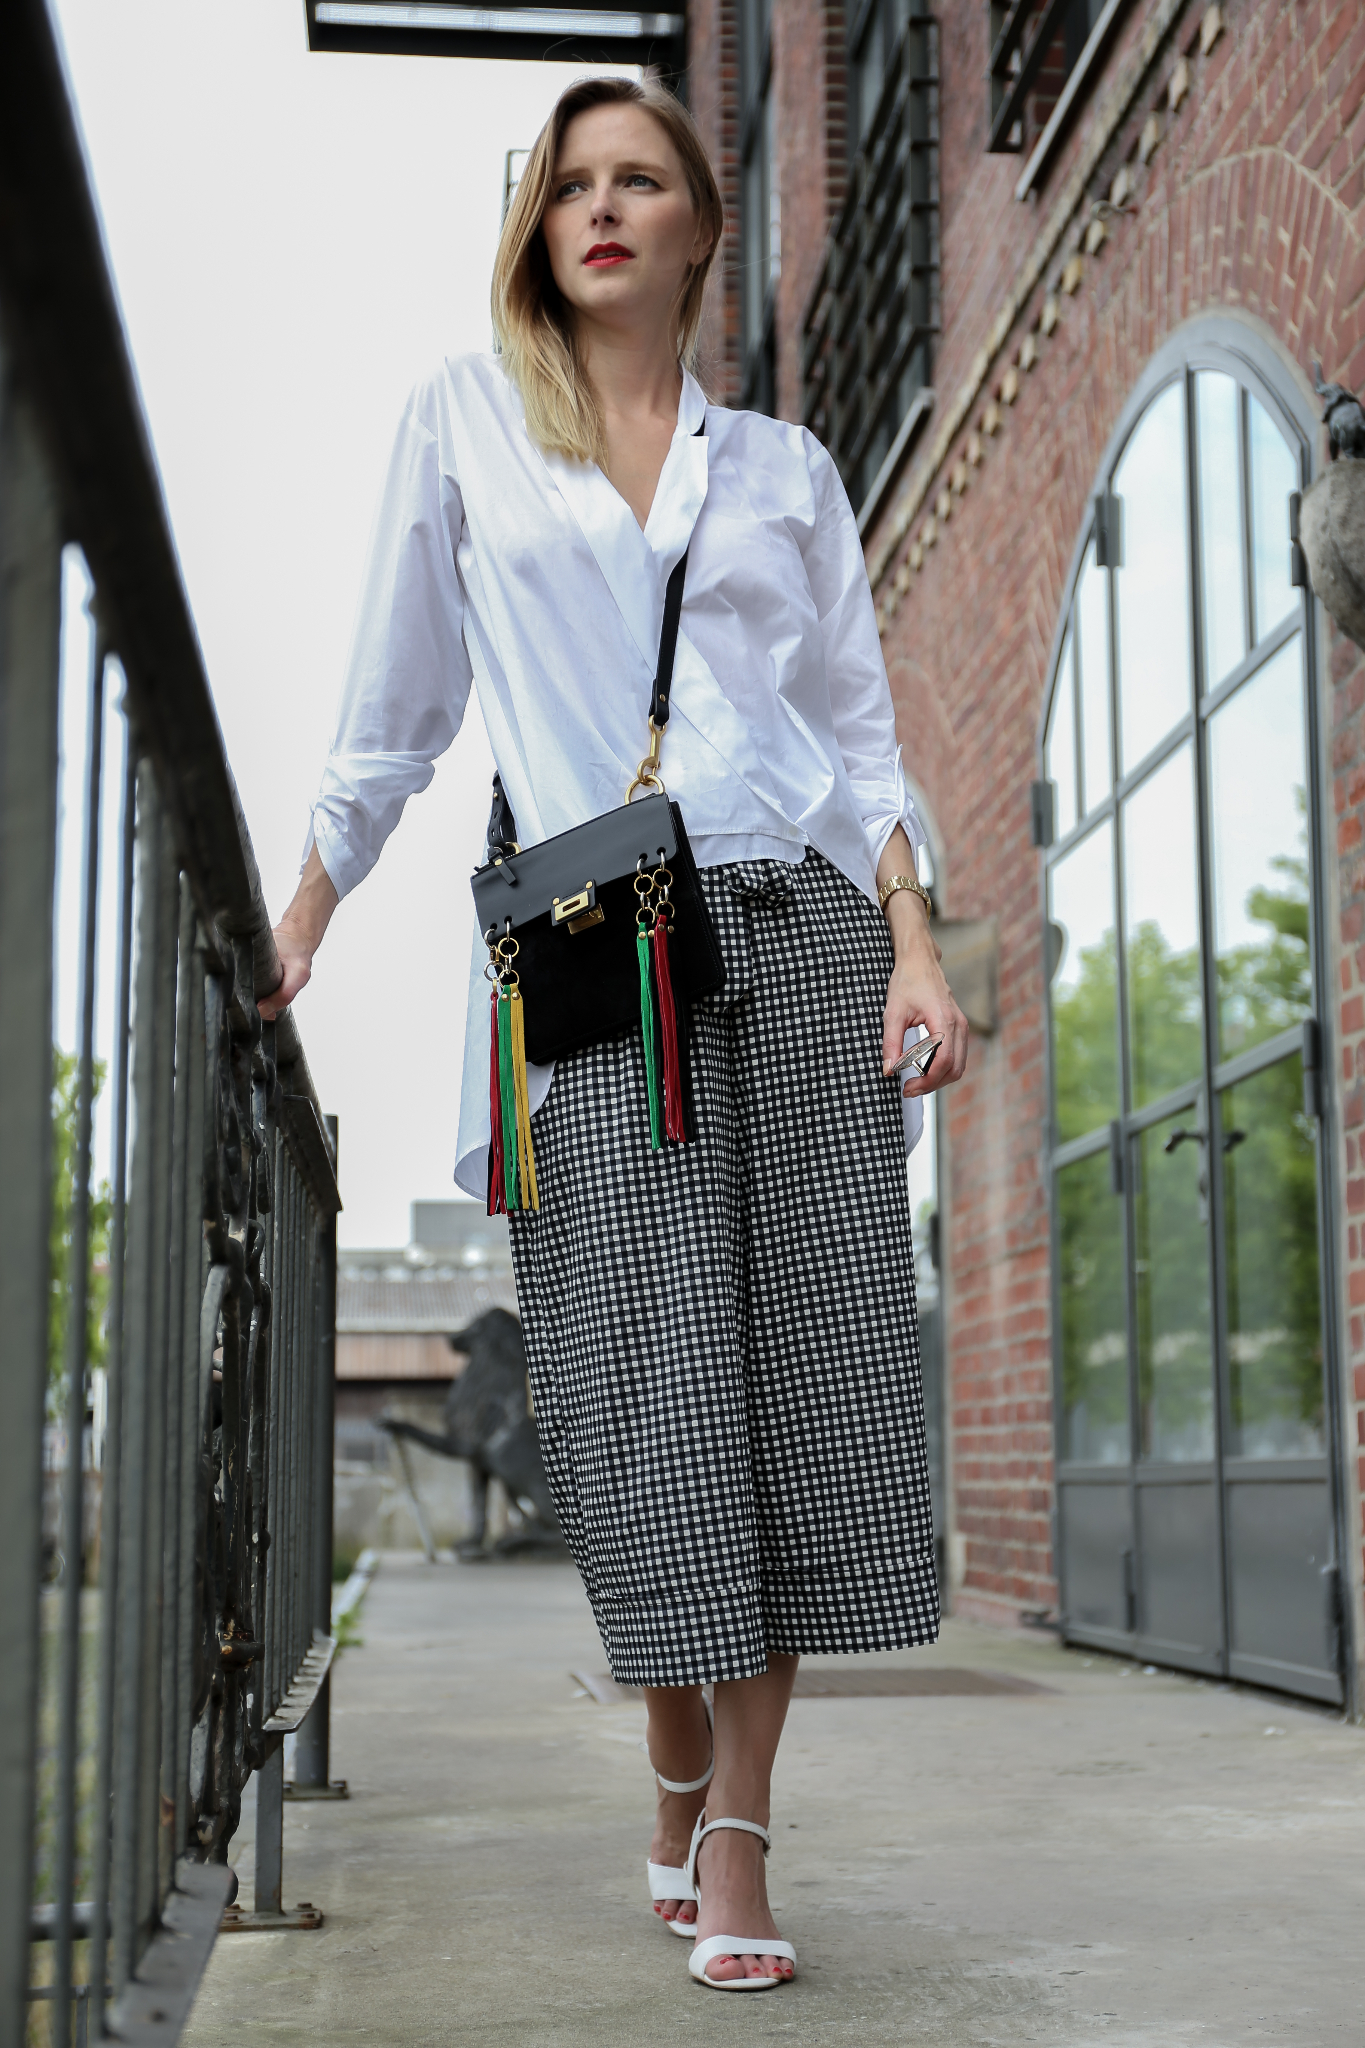 Fashion_Outfit_Chloé_Jane_Vichy_Print_MOD - by Monique-12